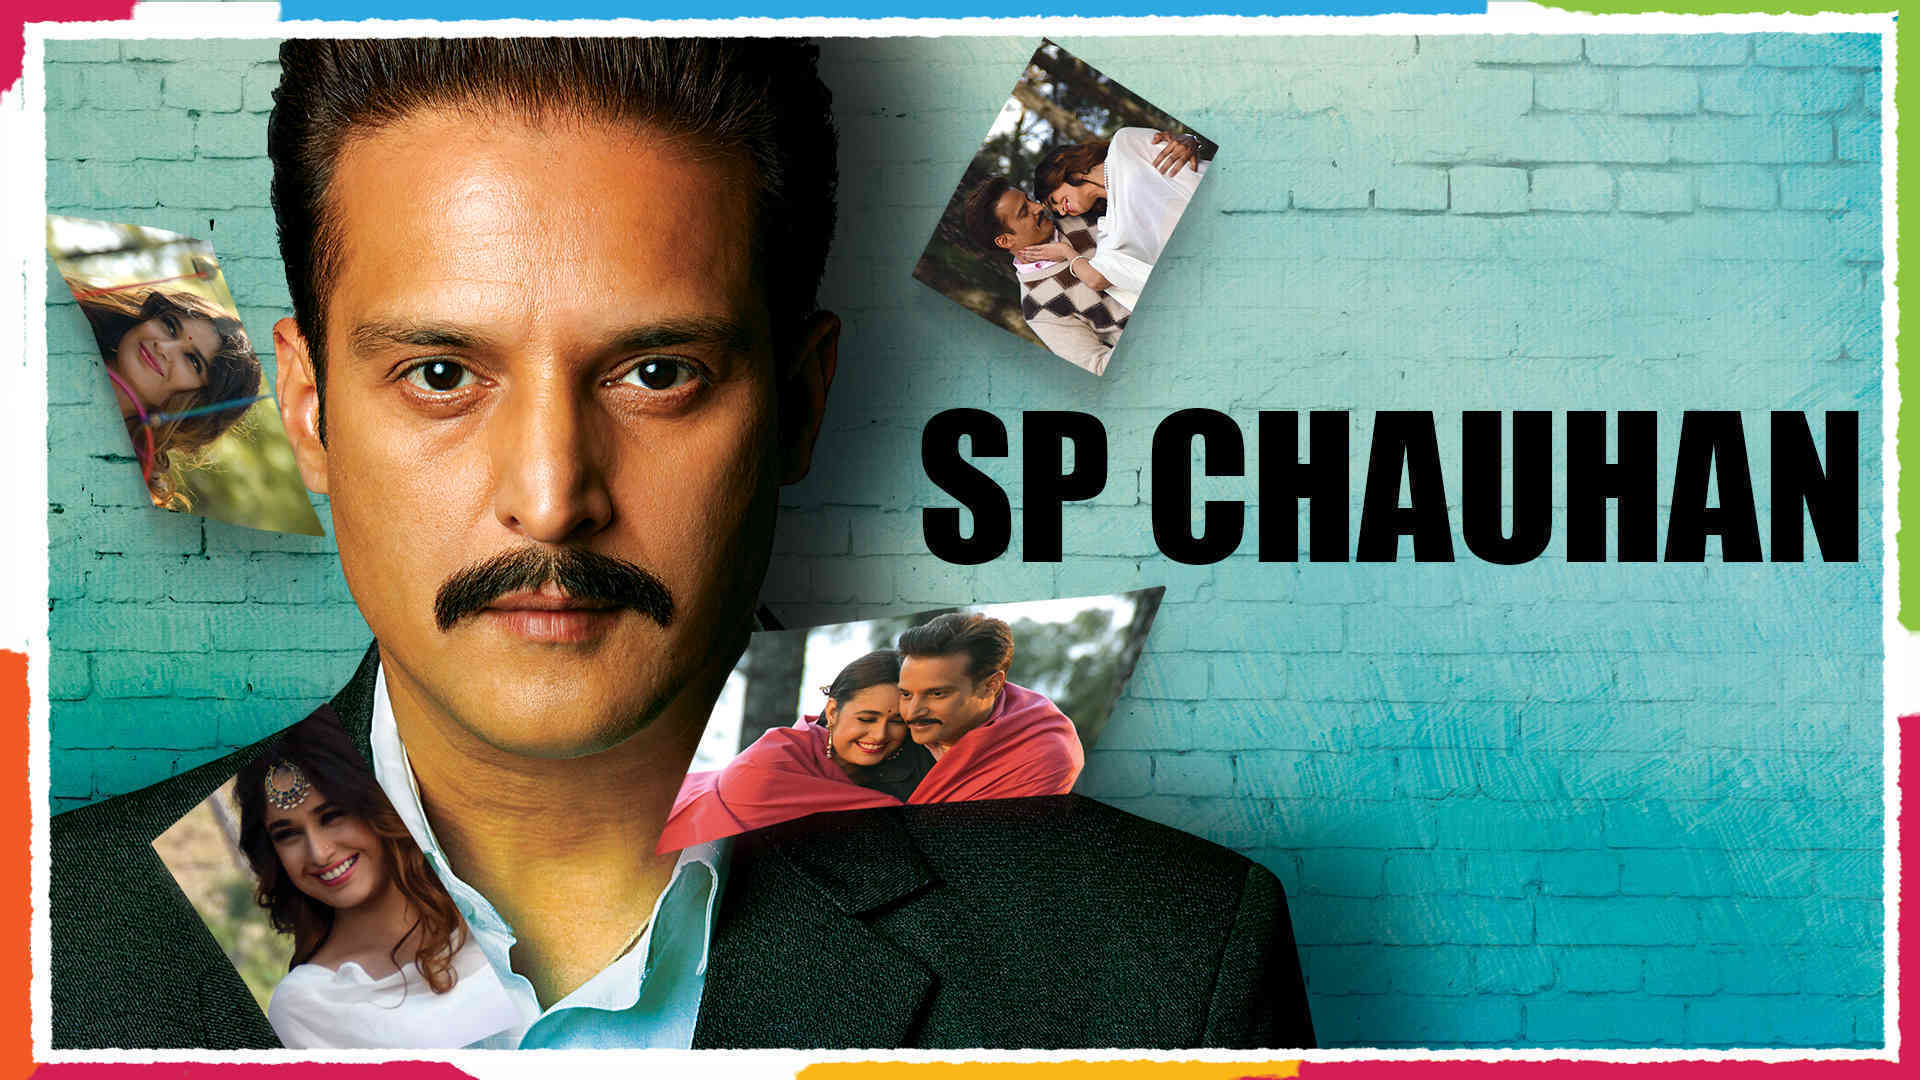 SP Chauhan: A Struggling Man